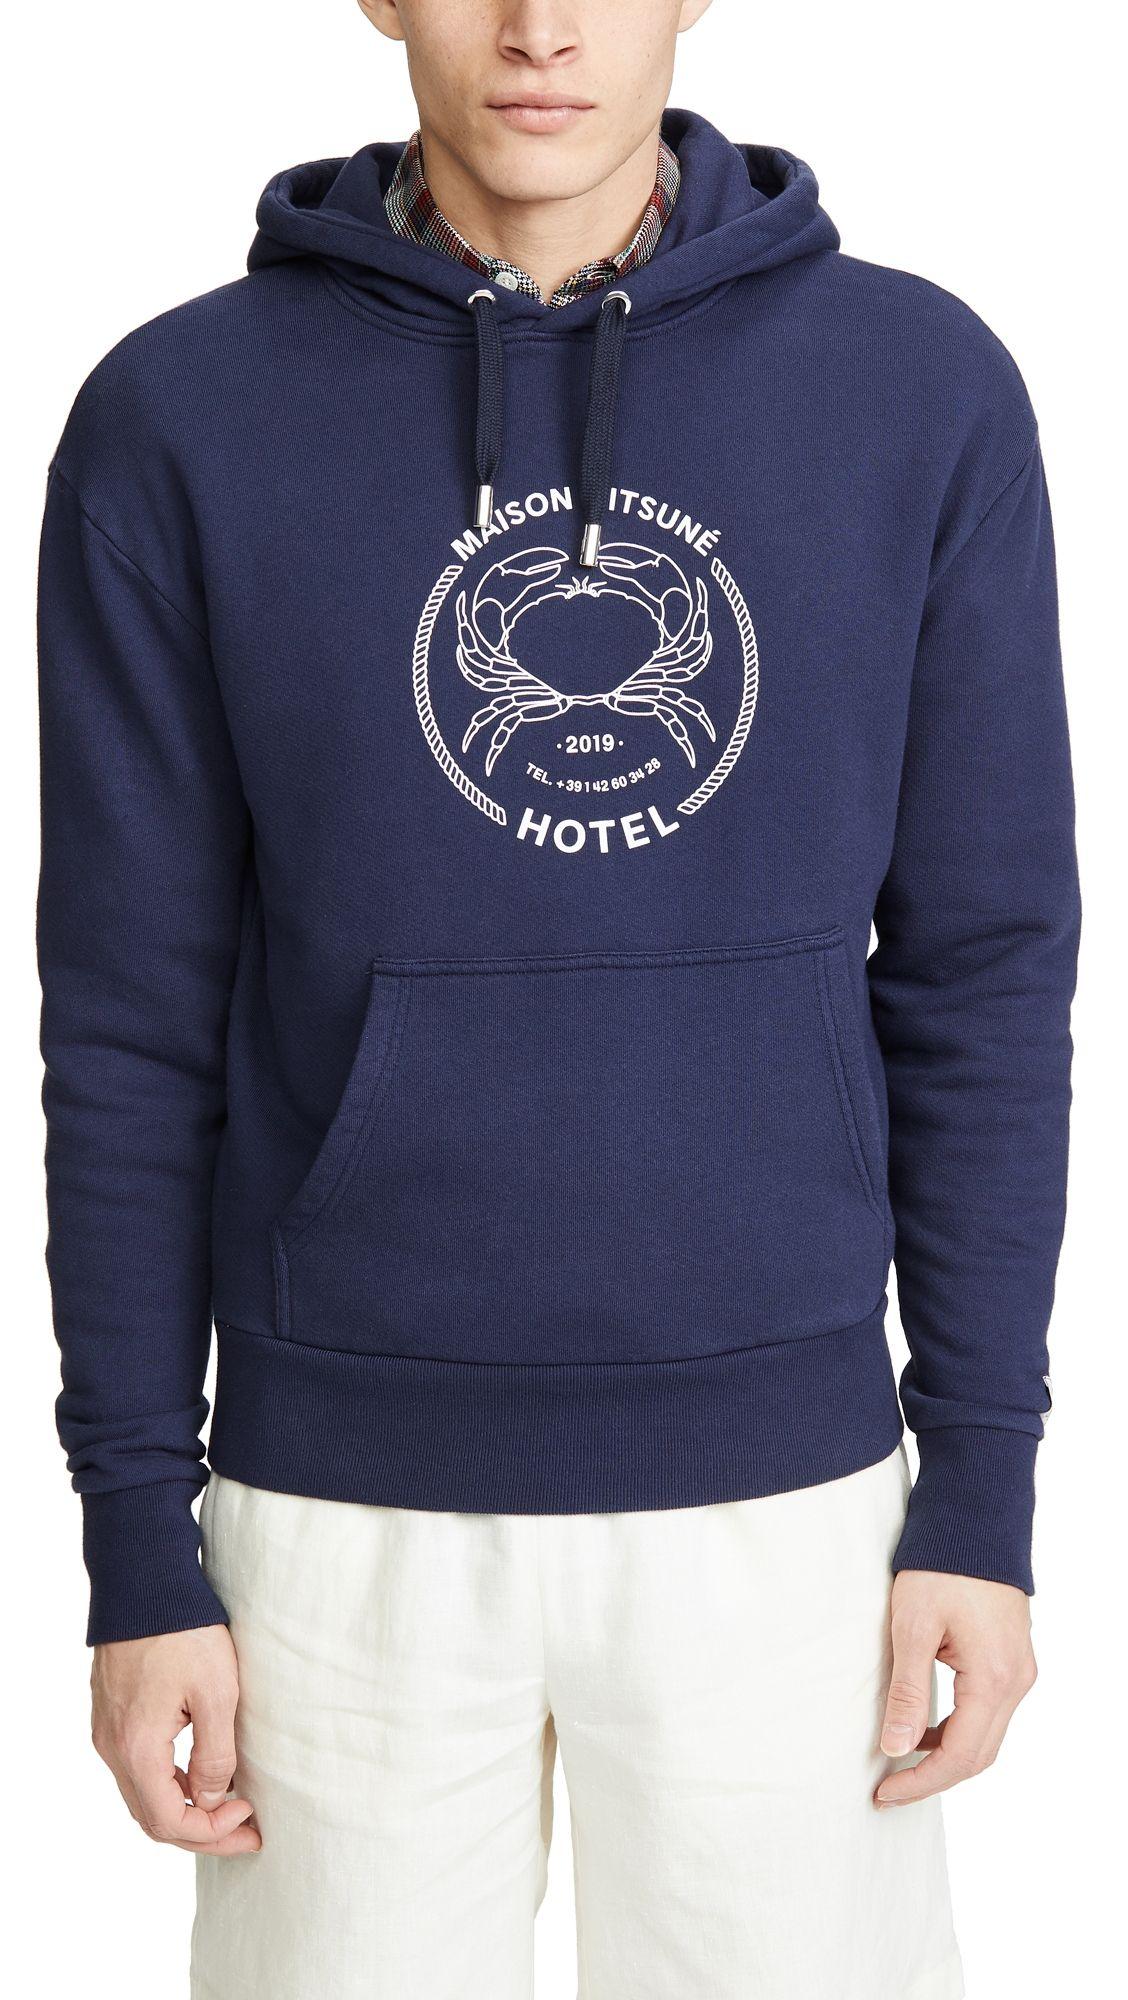 Maison Kitsune Hoodie Maisonkitsune Cloth Hoodies Maison Kitsune Sweatshirt Fashion [ 2000 x 1128 Pixel ]